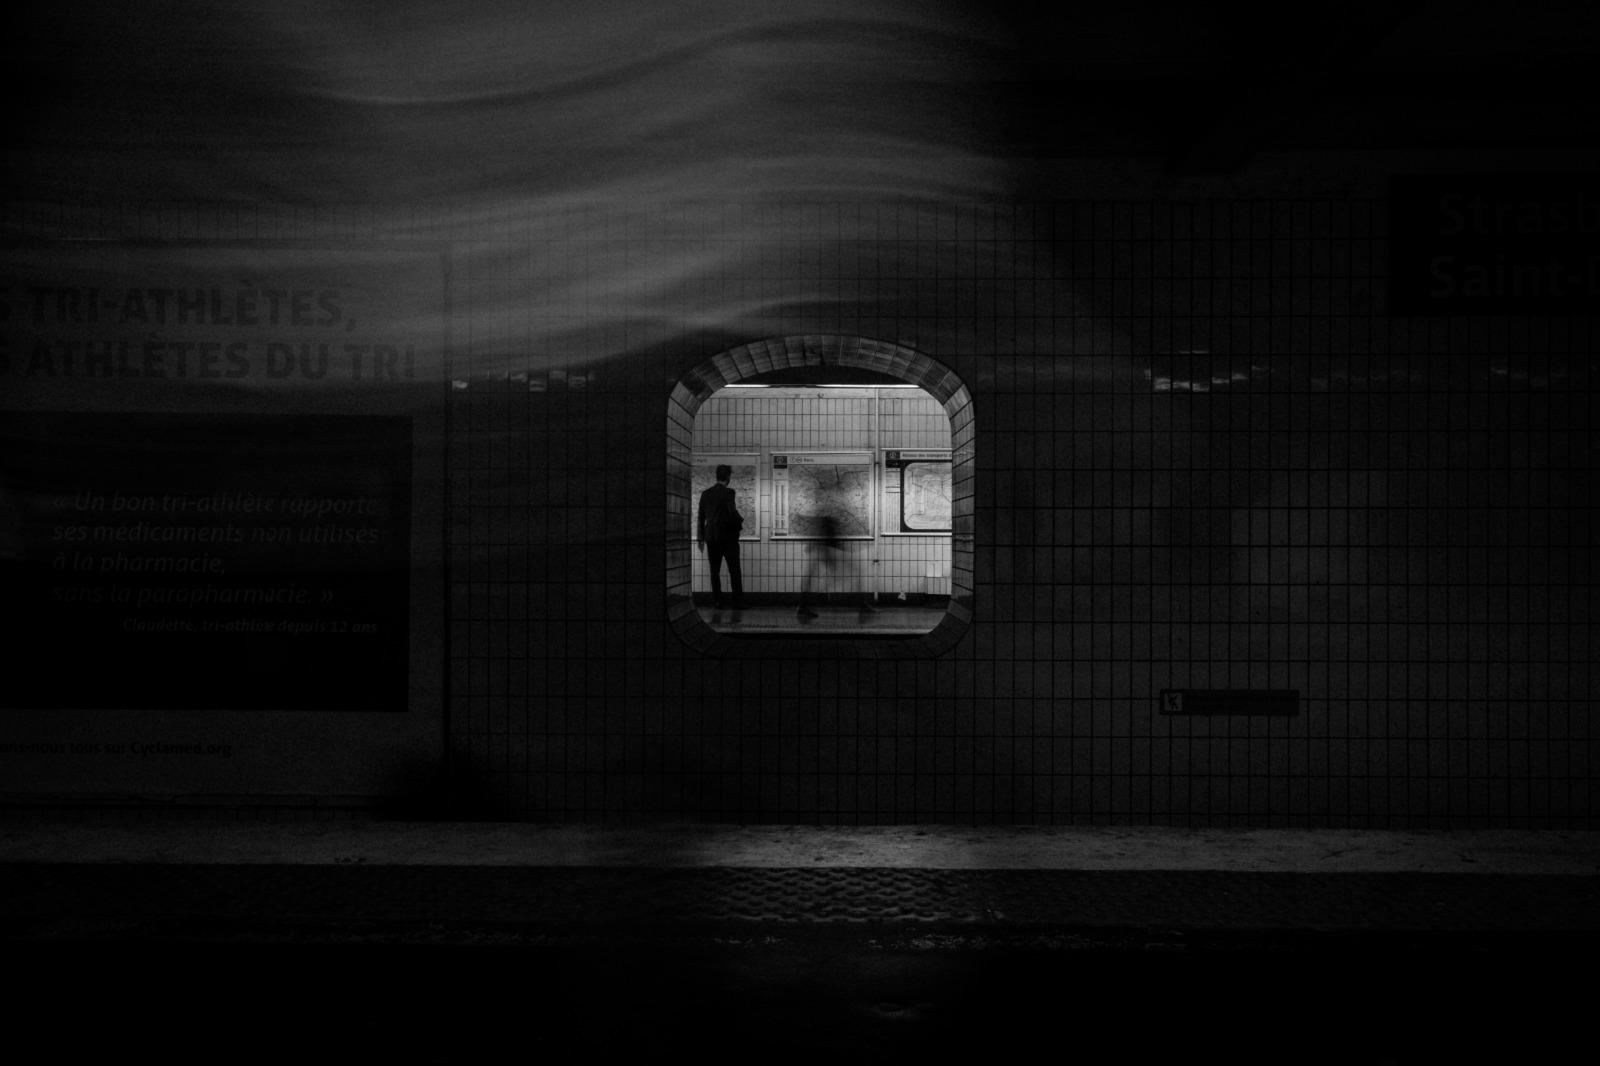 Categorie: Reportage, Street; Photo: SKAMIL; Location: Parigi, Francia